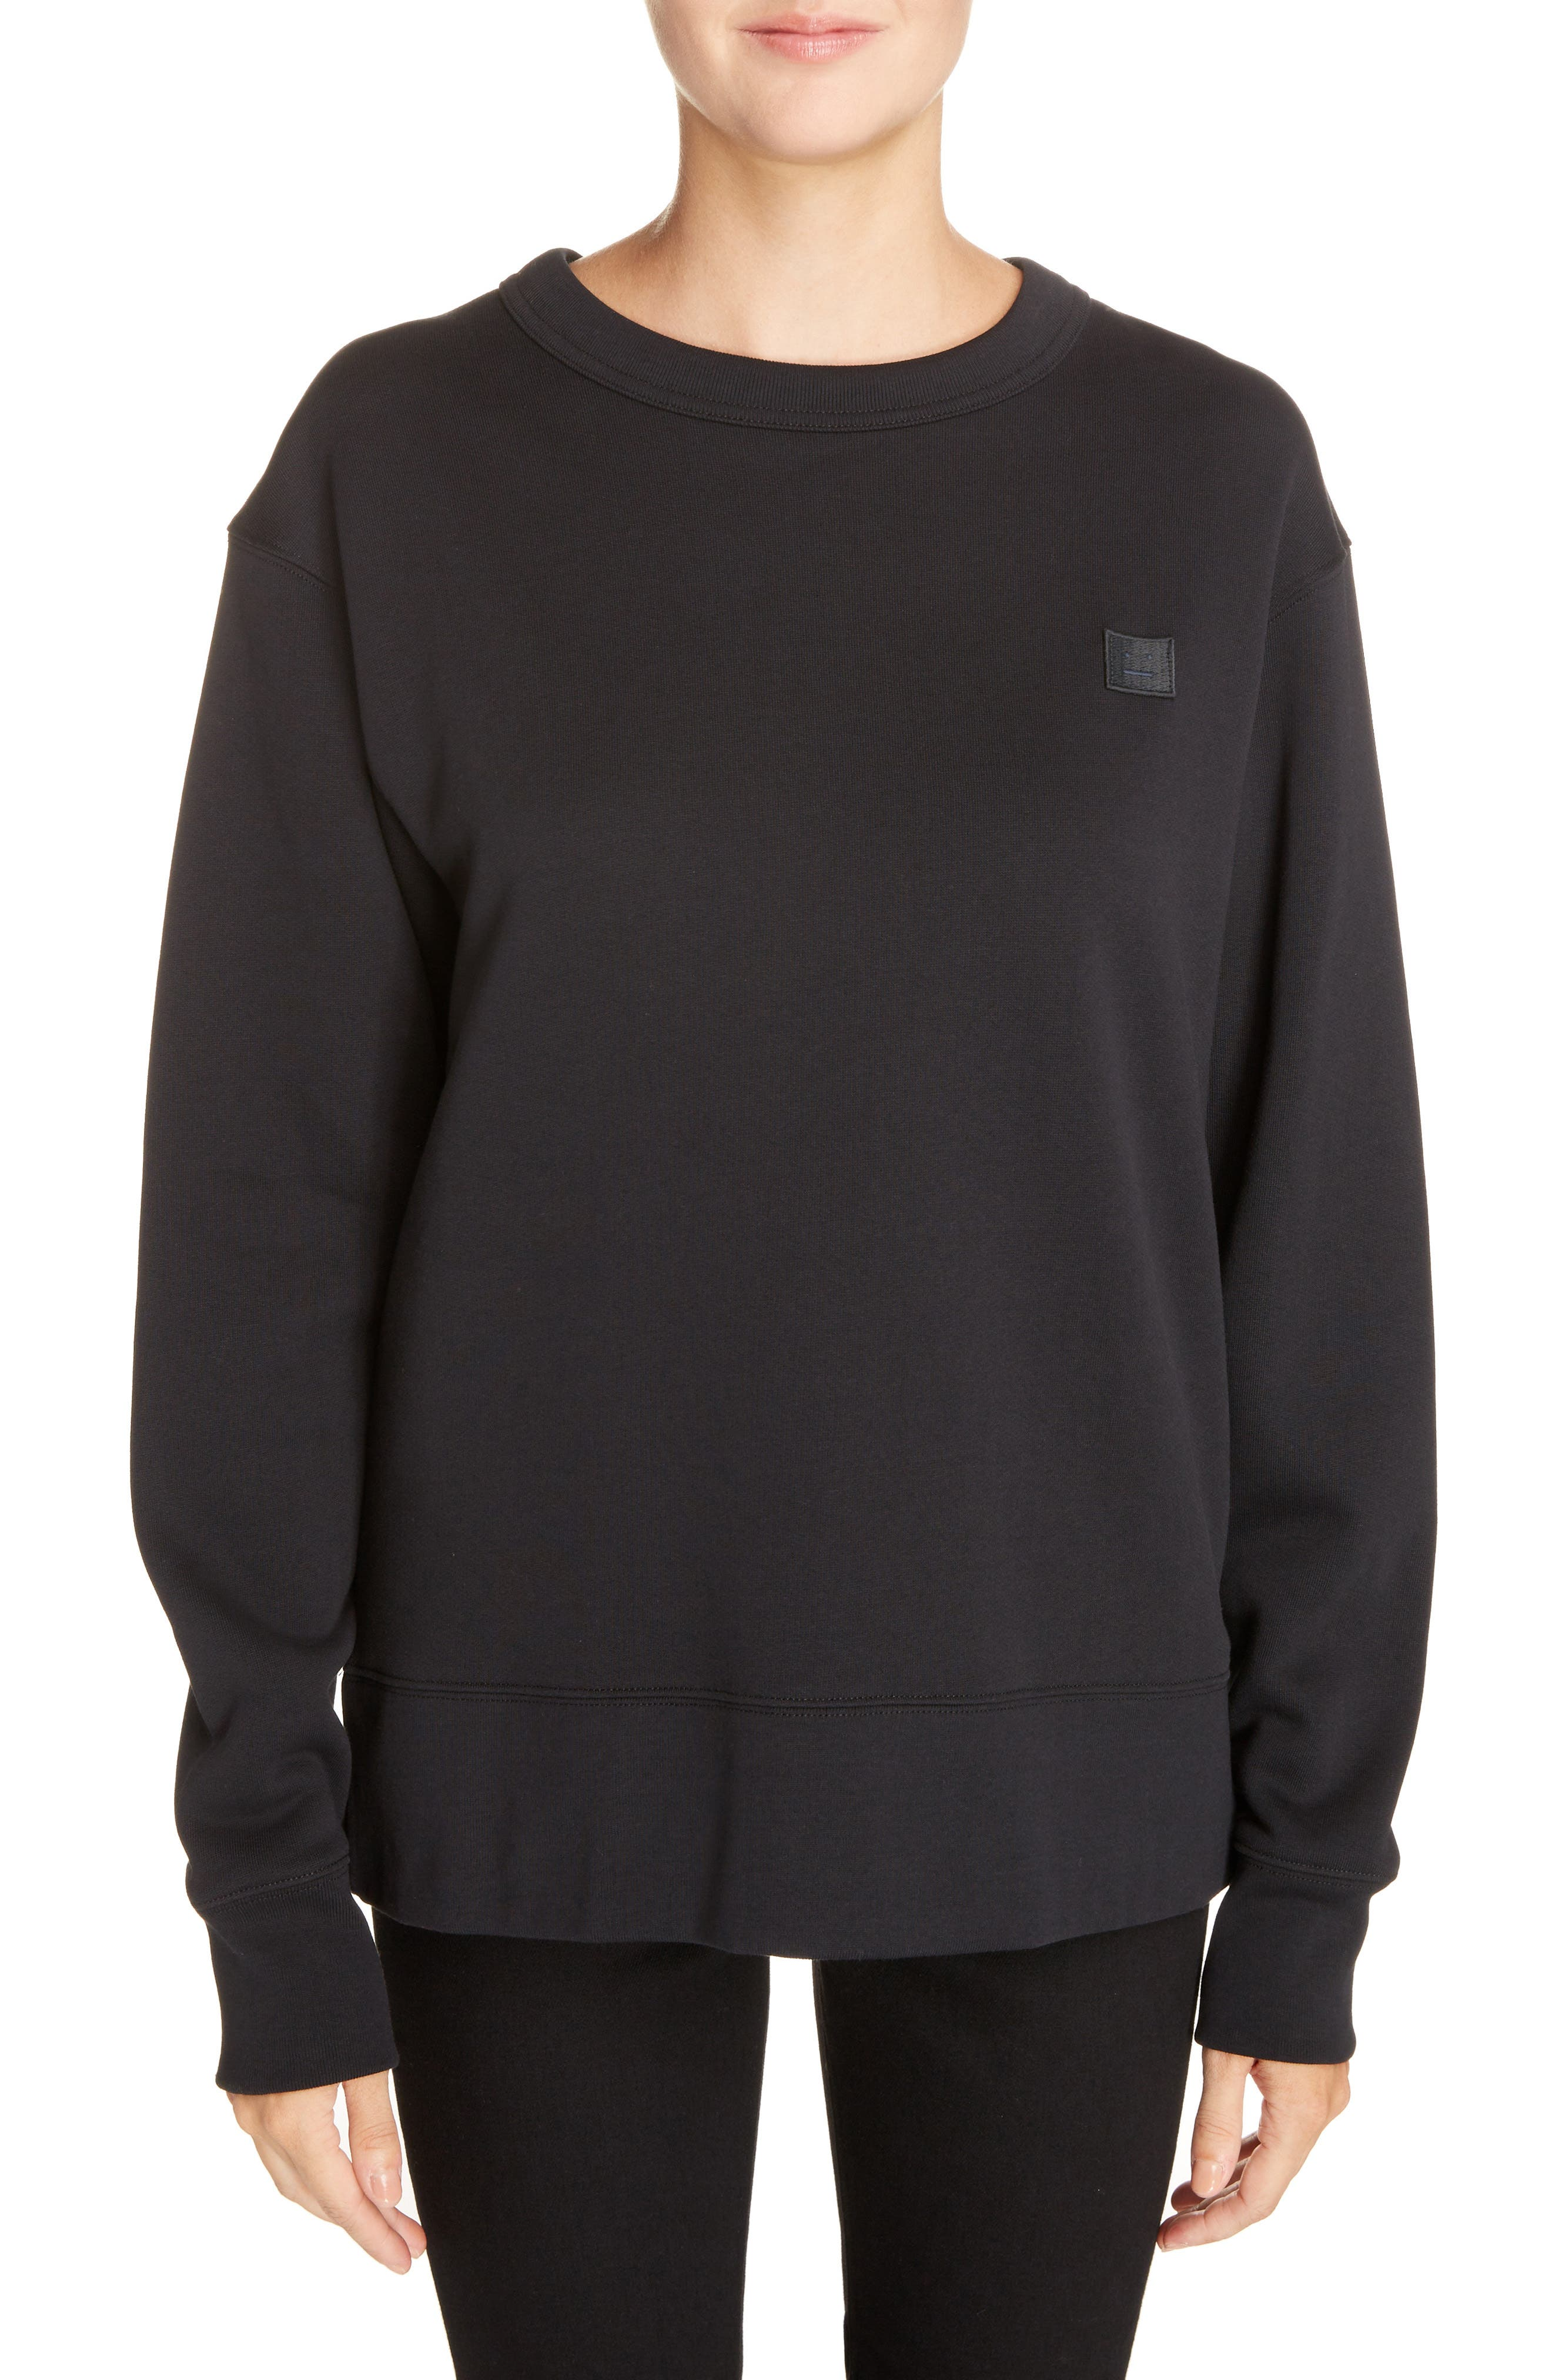 Fairview Crewneck Sweatshirt,                             Main thumbnail 1, color,                             001